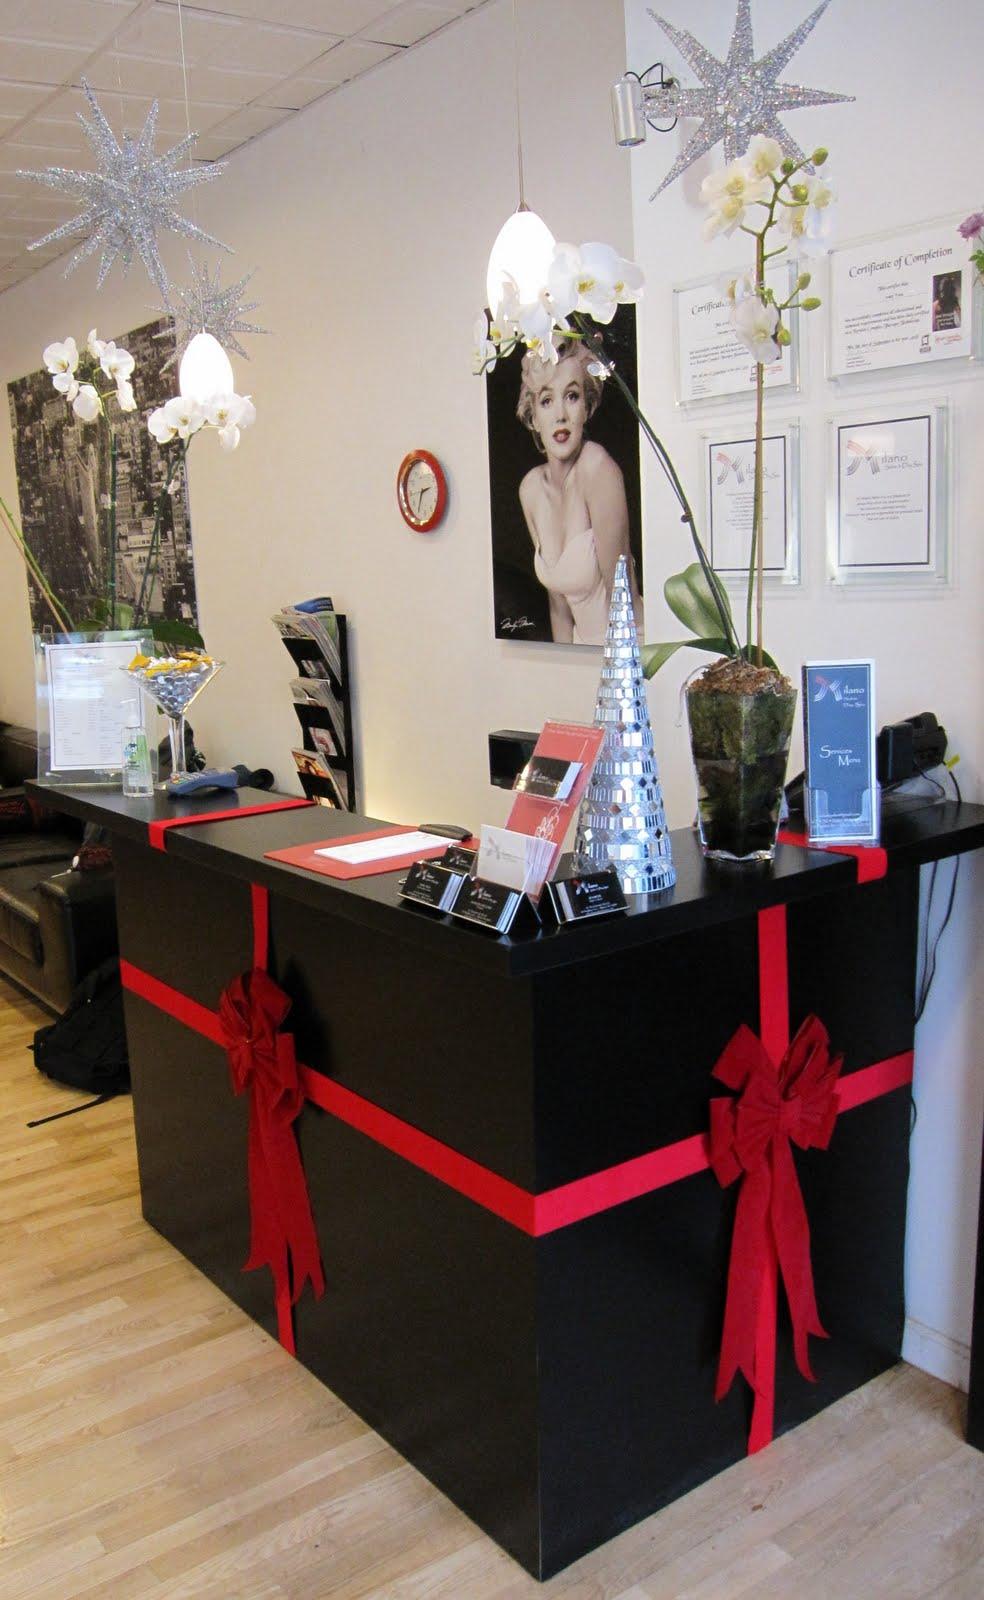 milano salon day spa holiday cheer november 2009. Black Bedroom Furniture Sets. Home Design Ideas